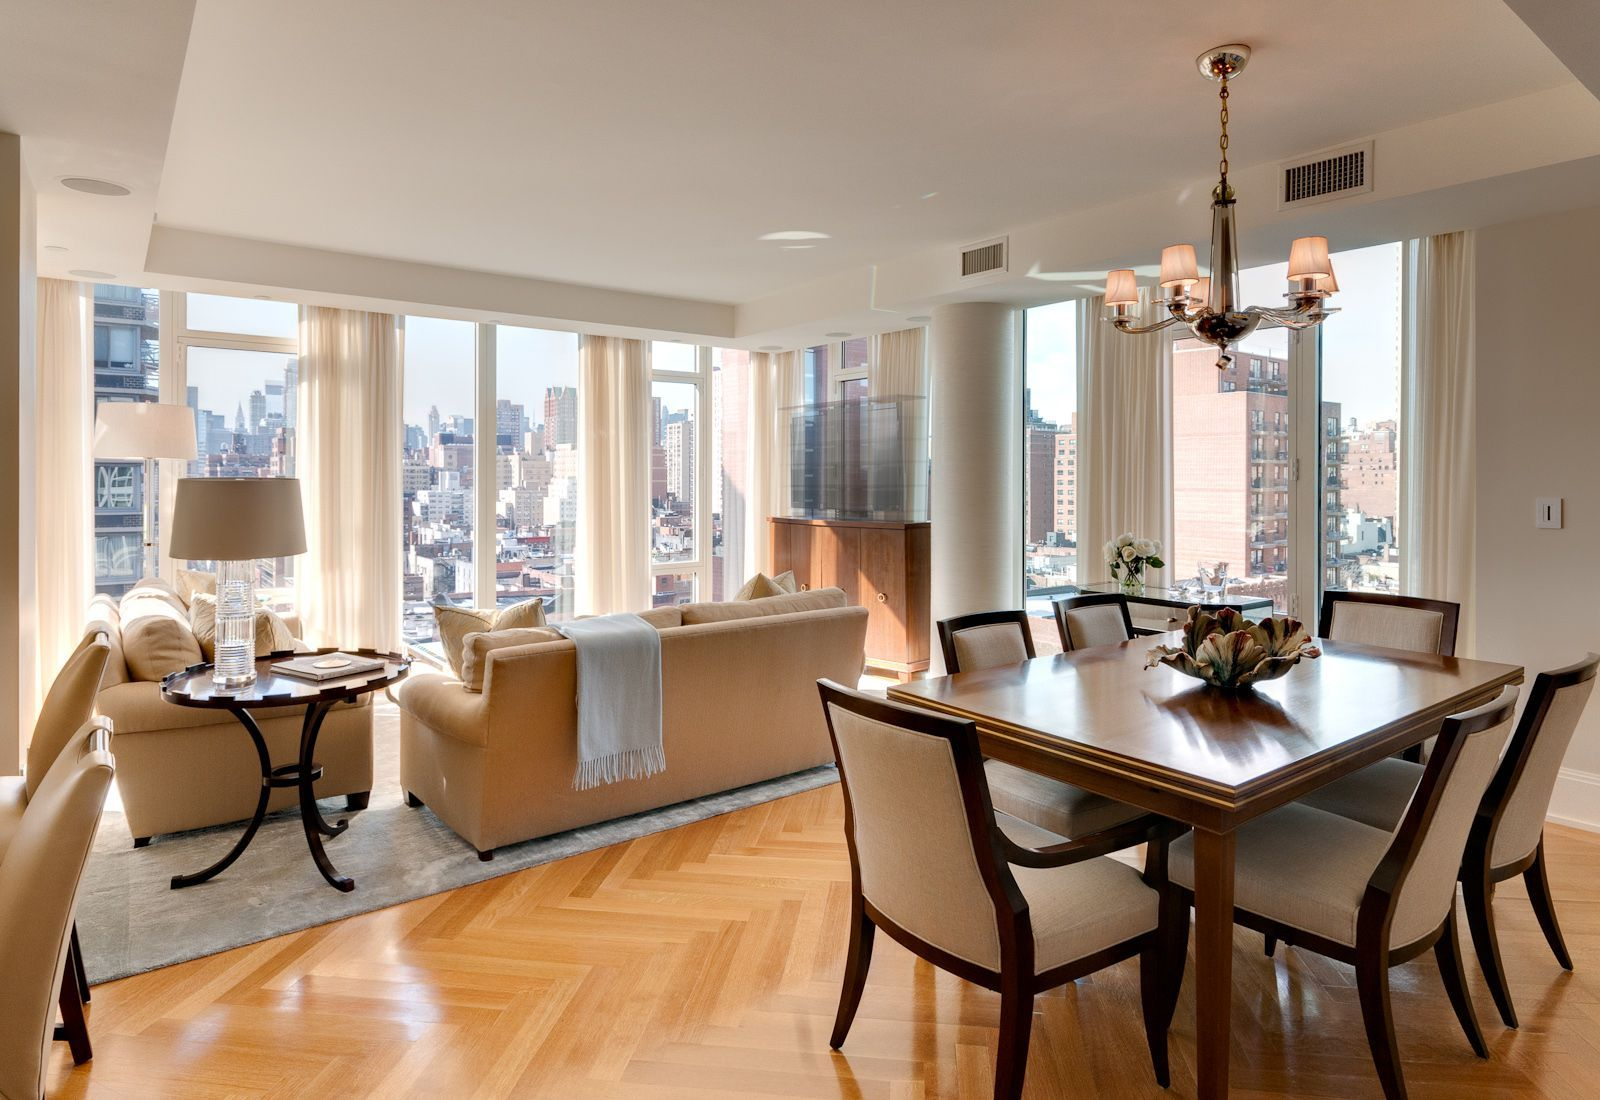 combined living and dining room design   Elegant Small Living Room Dining Room Combination 1600×1100 Wallpaper   Ruang keluarga kecil